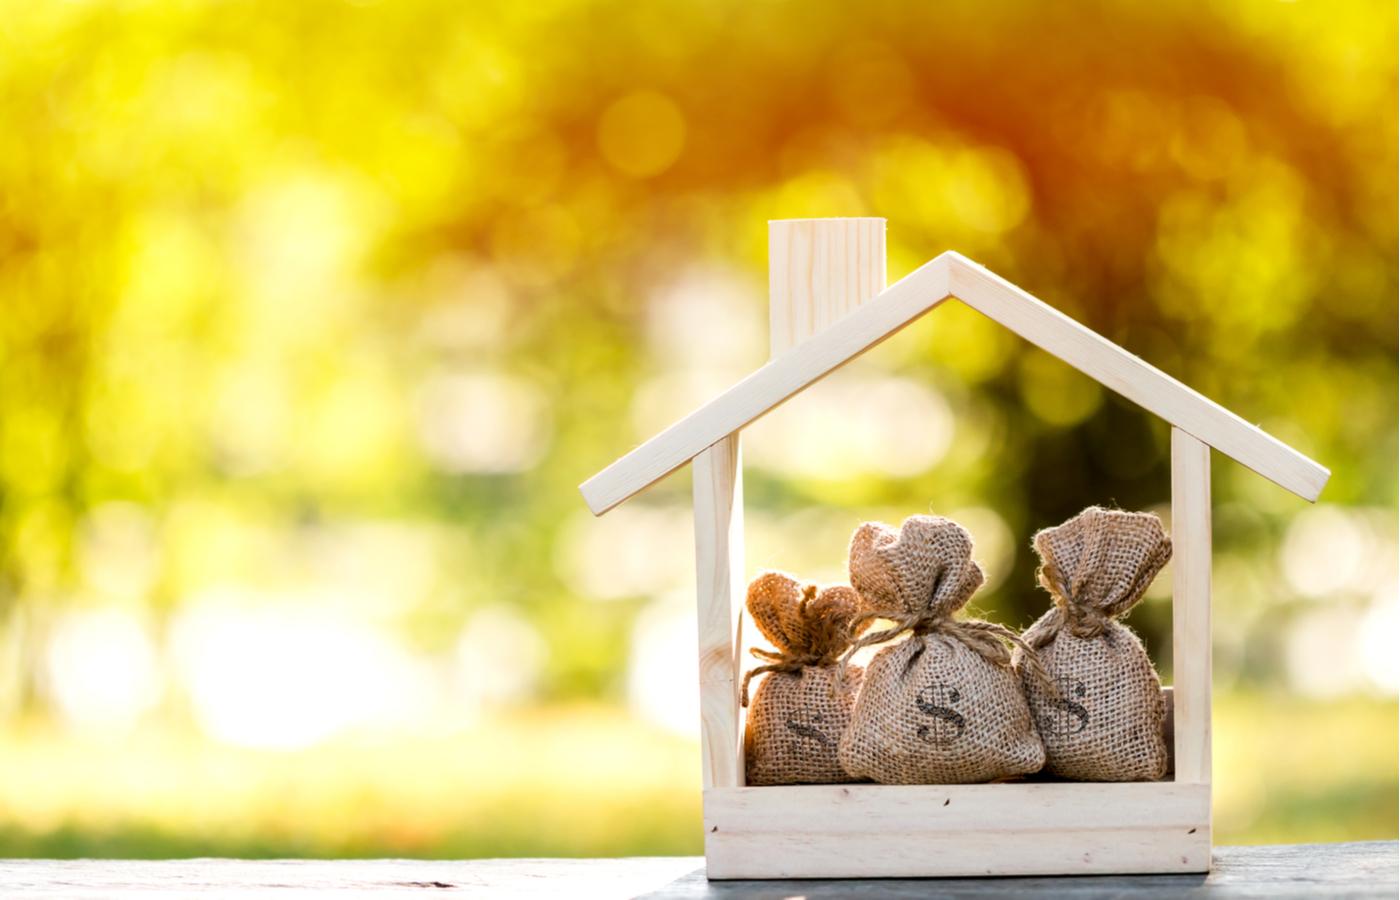 Cómo aprovechar tu aguinaldo: usa tu dinero inteligentemente en tu casa